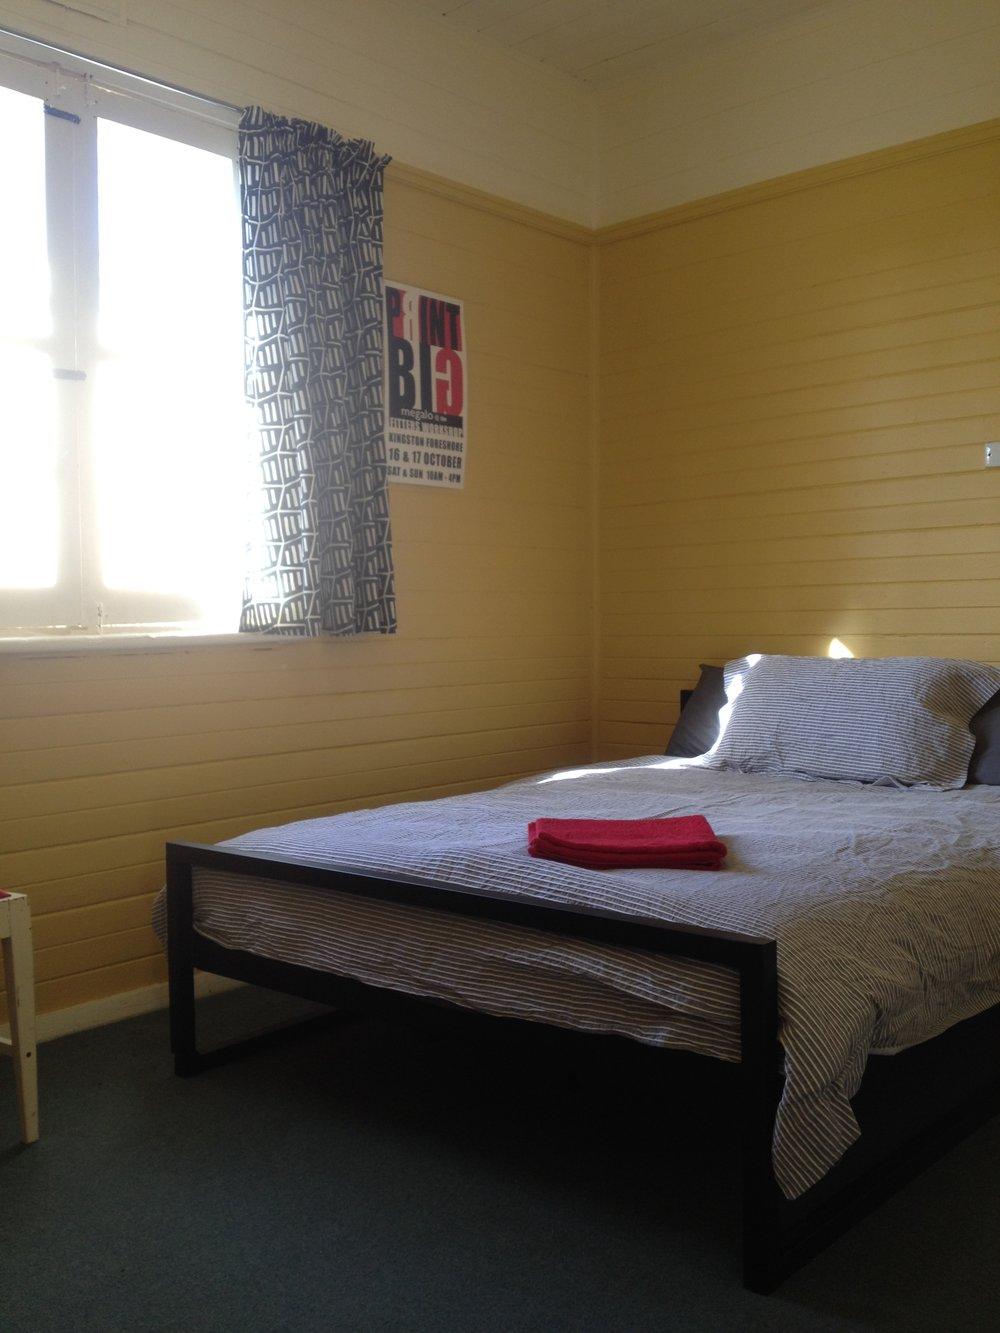 Cargills_Bedroom_2.JPG